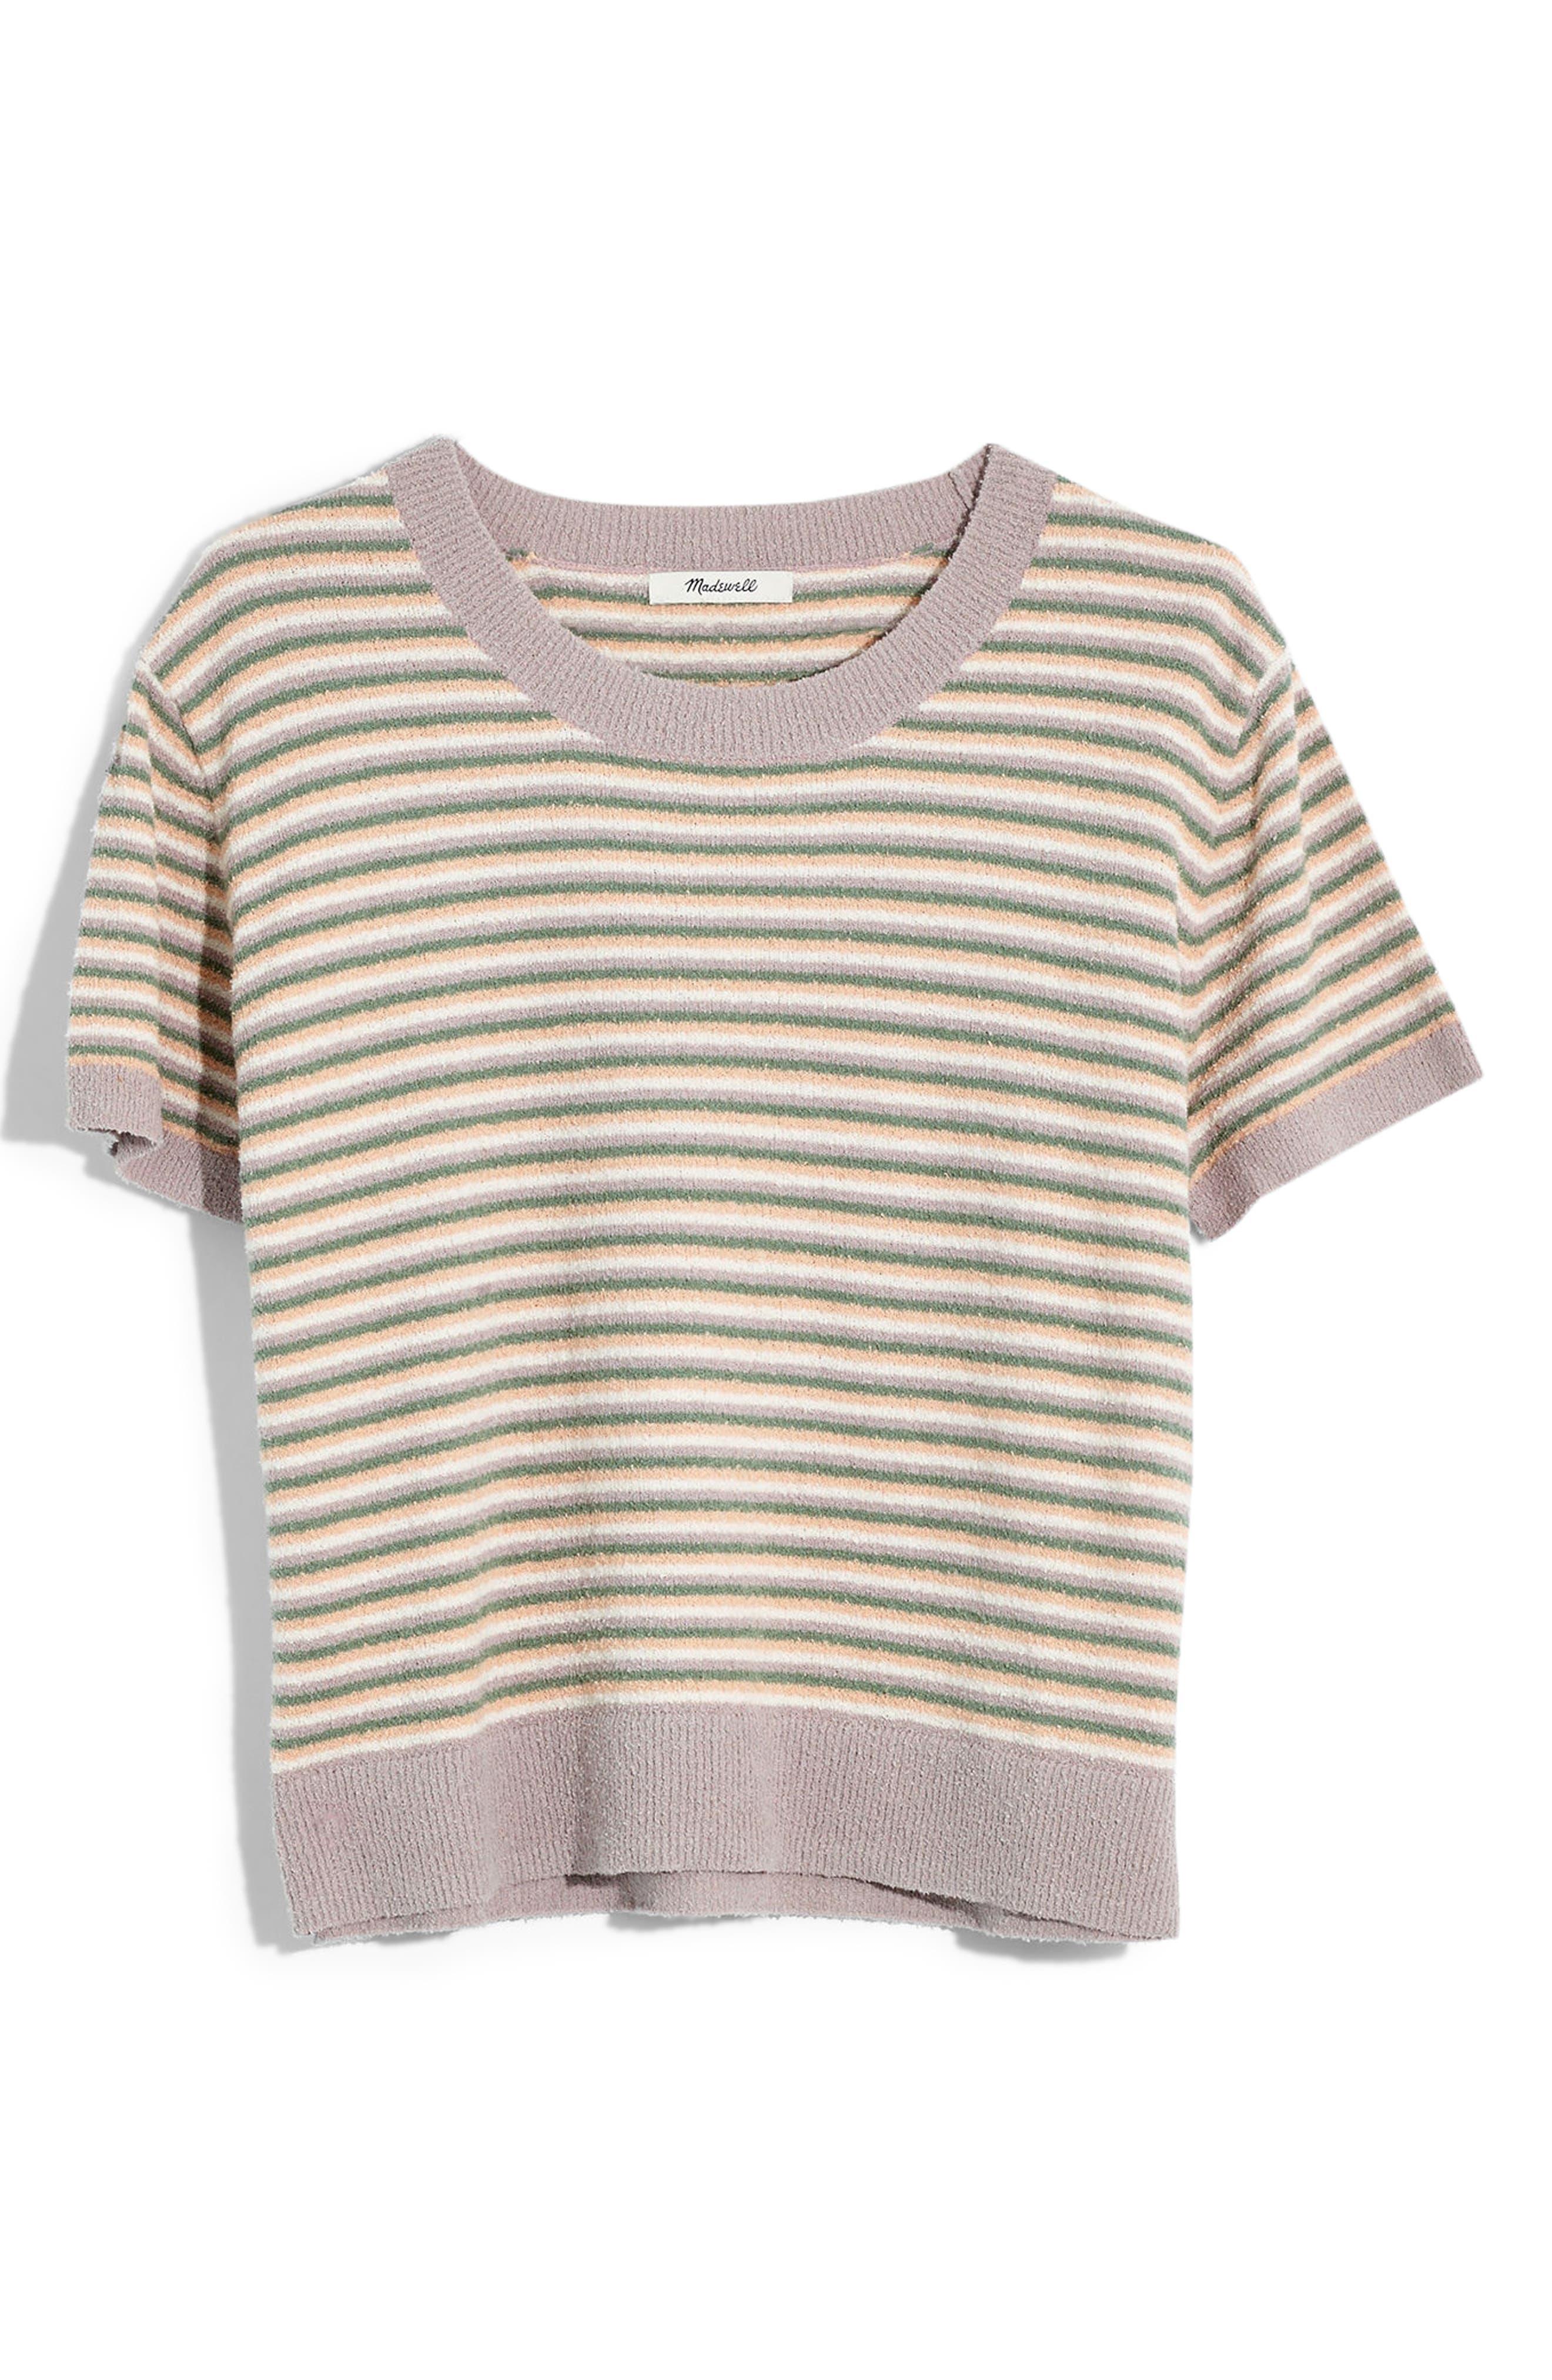 Madewell Stripe Lakedale Sweater Tee, Ivory